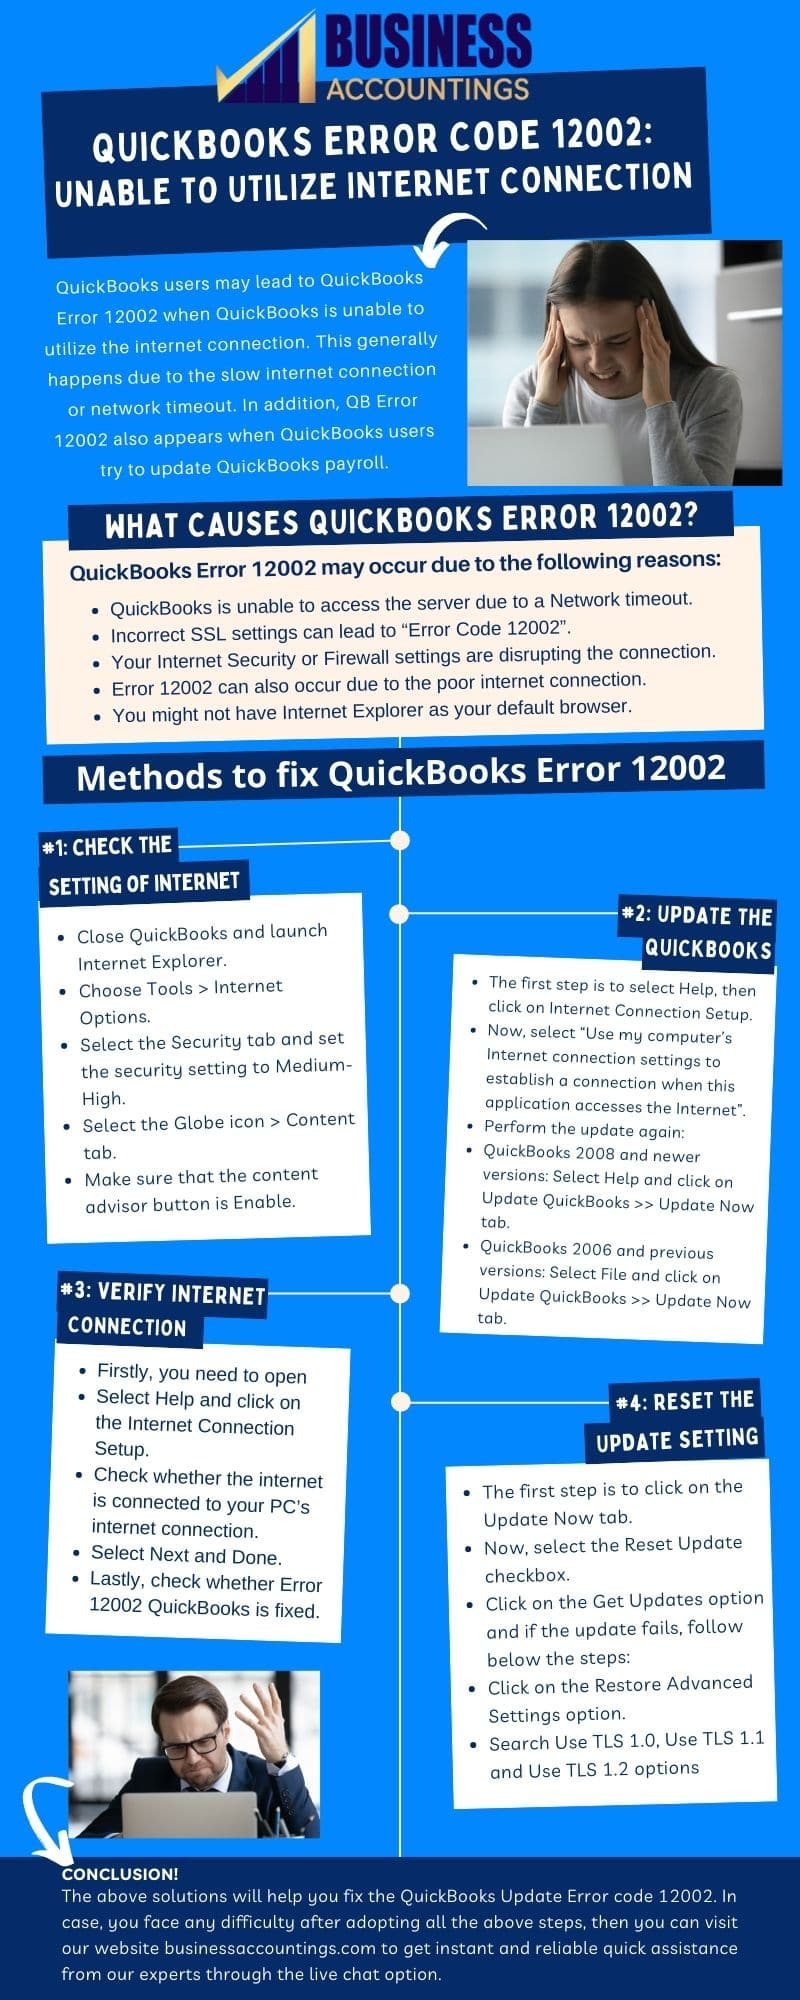 Infographic of Solution for QuickBooks Error Code 12002